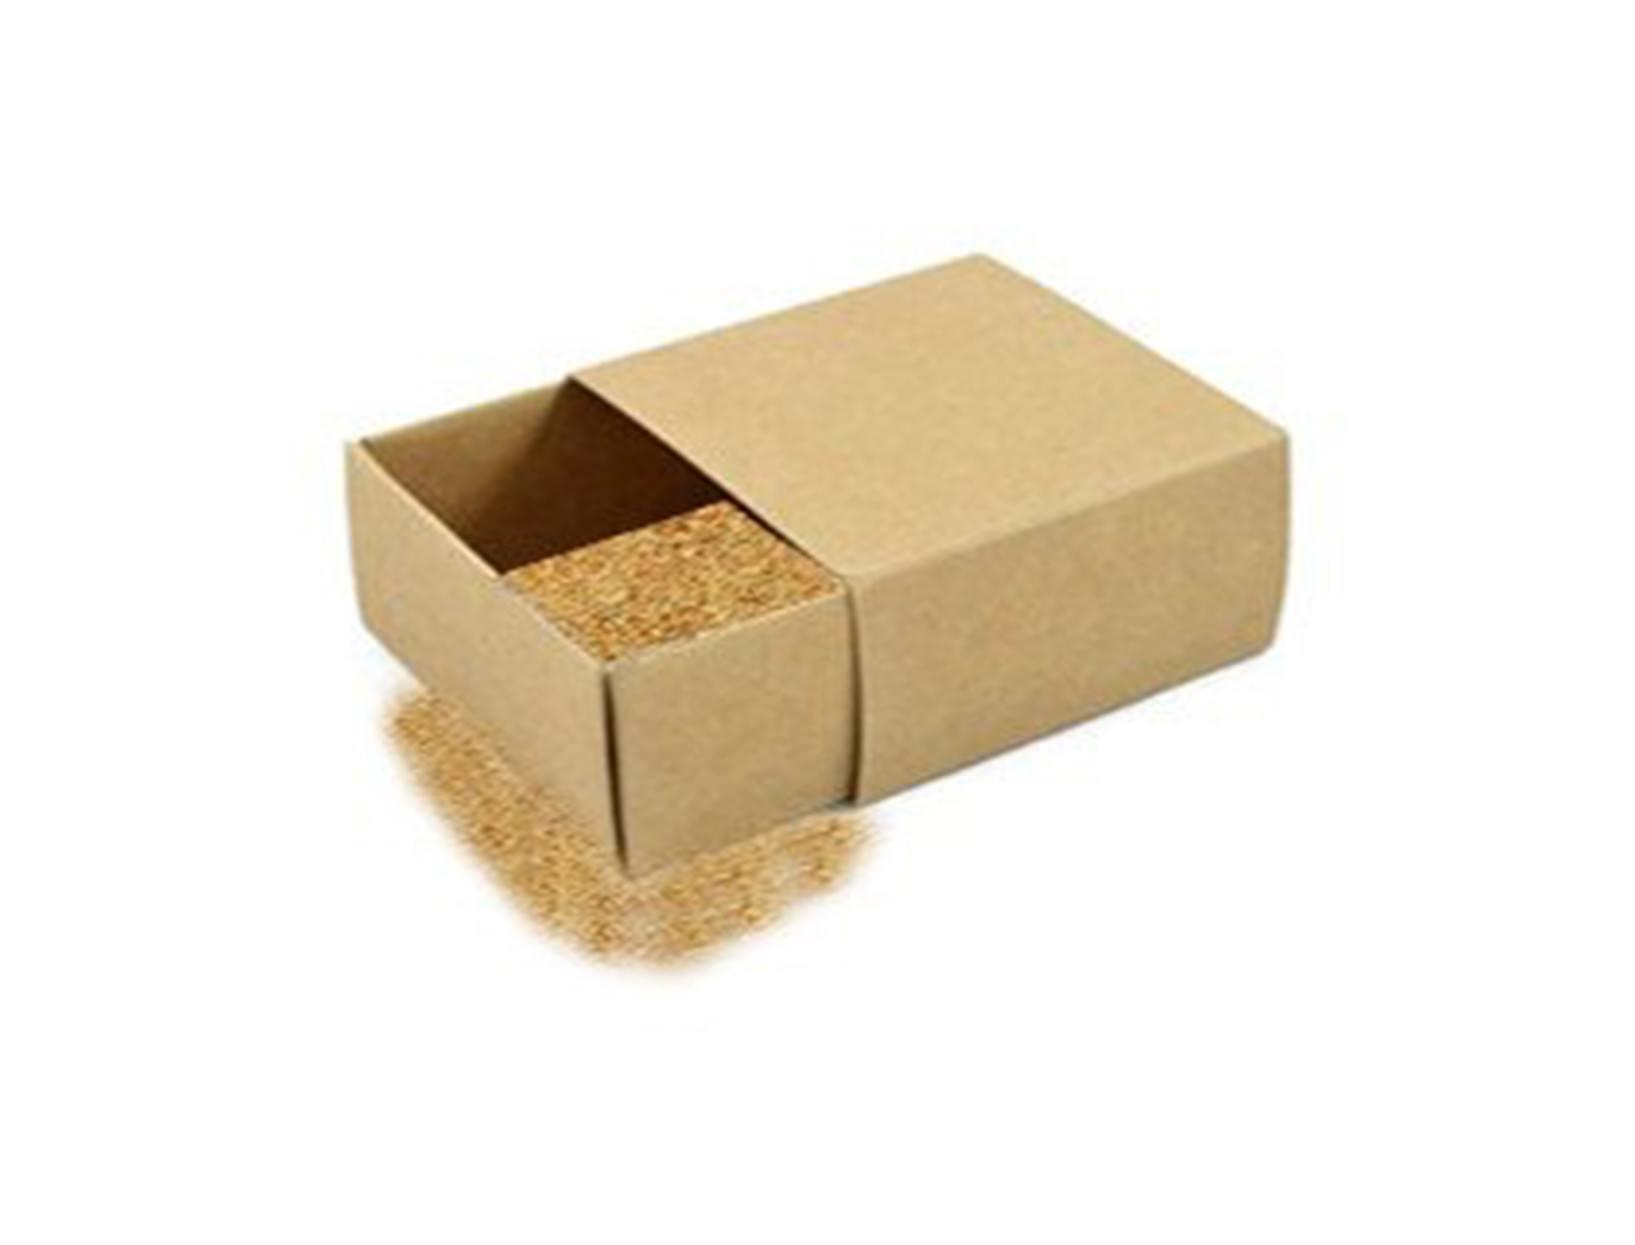 Annoying box of sand